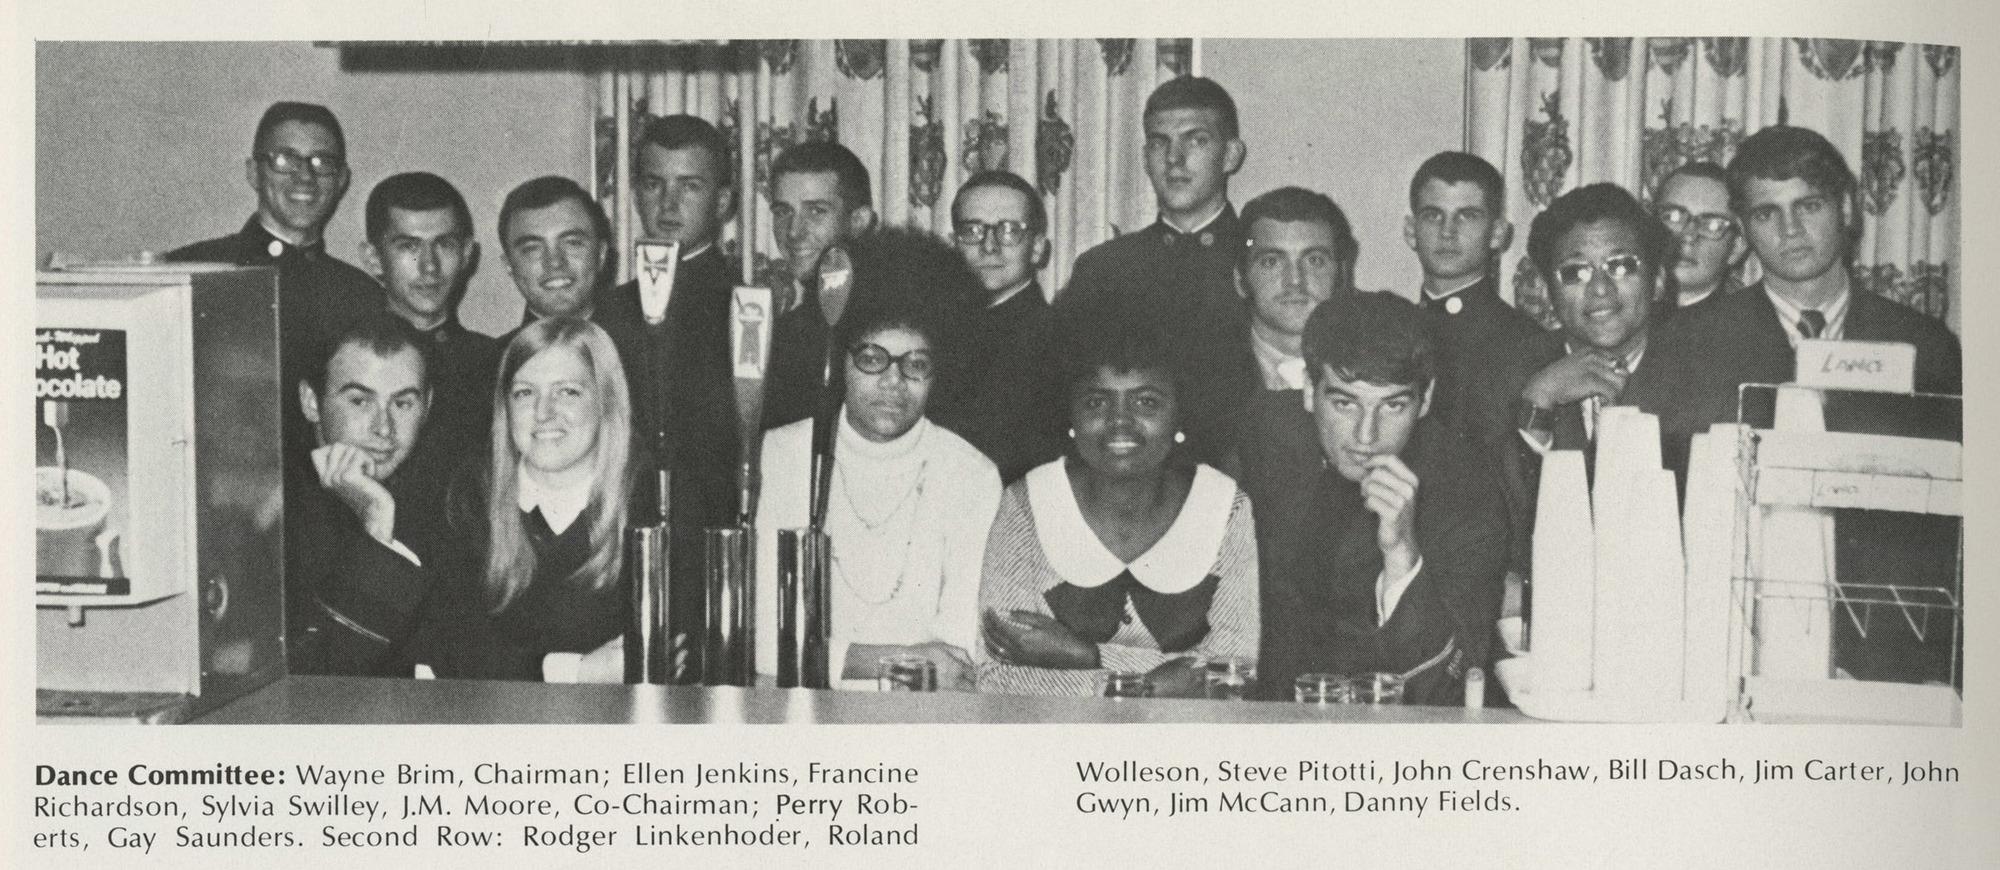 http://spec.lib.vt.edu/pickup/Omeka_upload/Bugle1971_pg268_StudentUnion.jpg